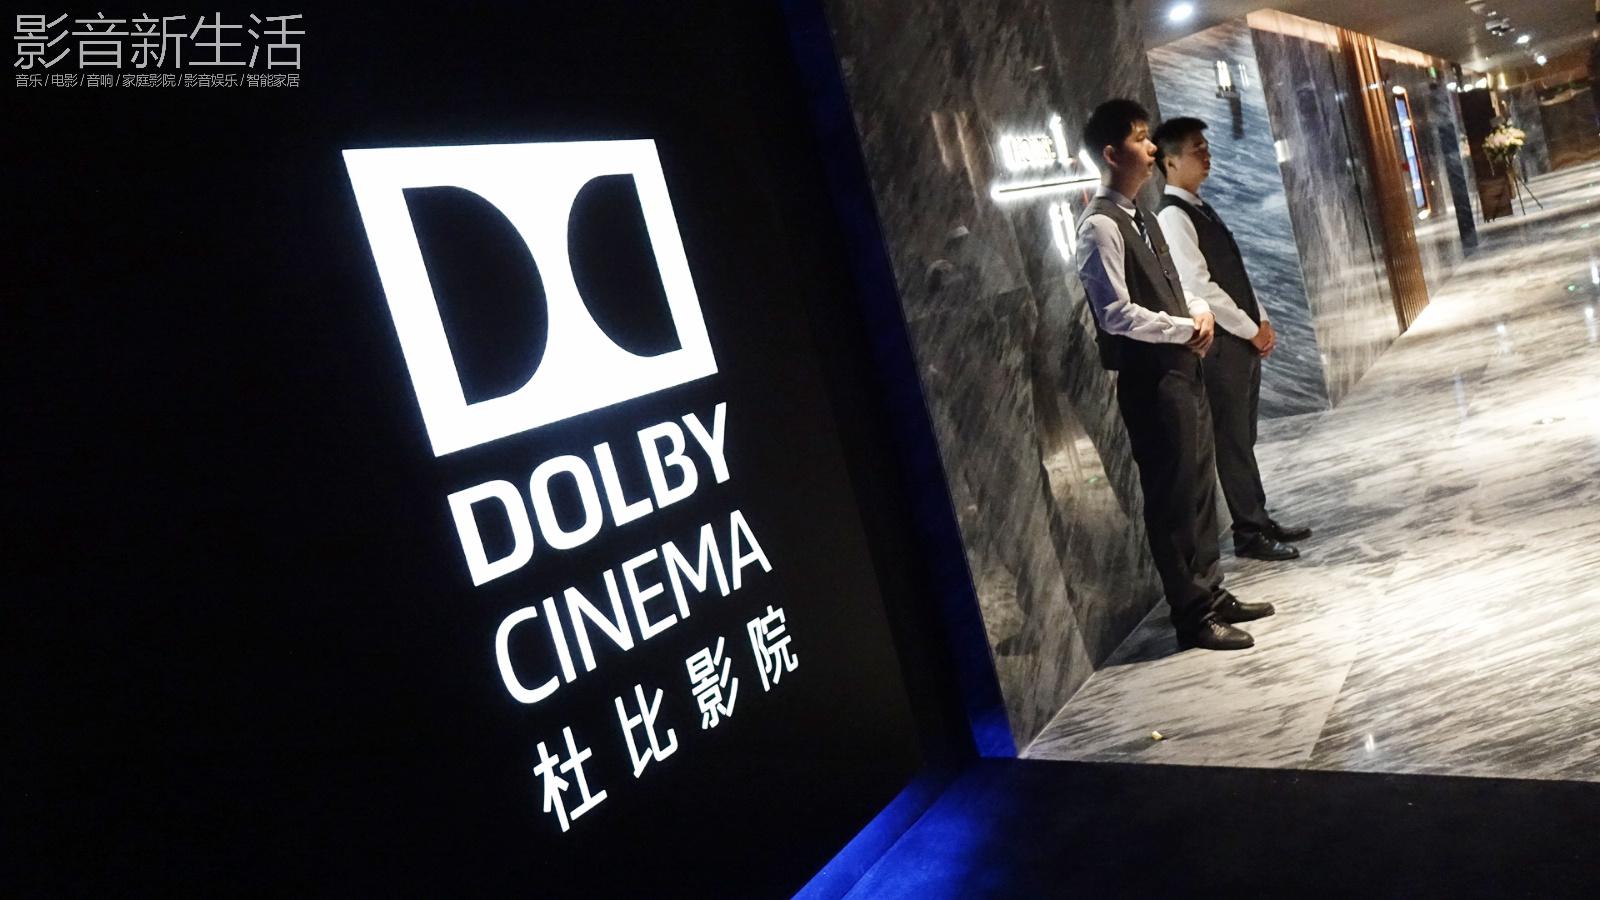 "DOLBY CINEMA SHENZHEN ATMOS DOLBYVISION 14 - 现场   ""影院界的全新标杆"" 深圳首家Dolby Cinema杜比影院落户深圳湾万象城"